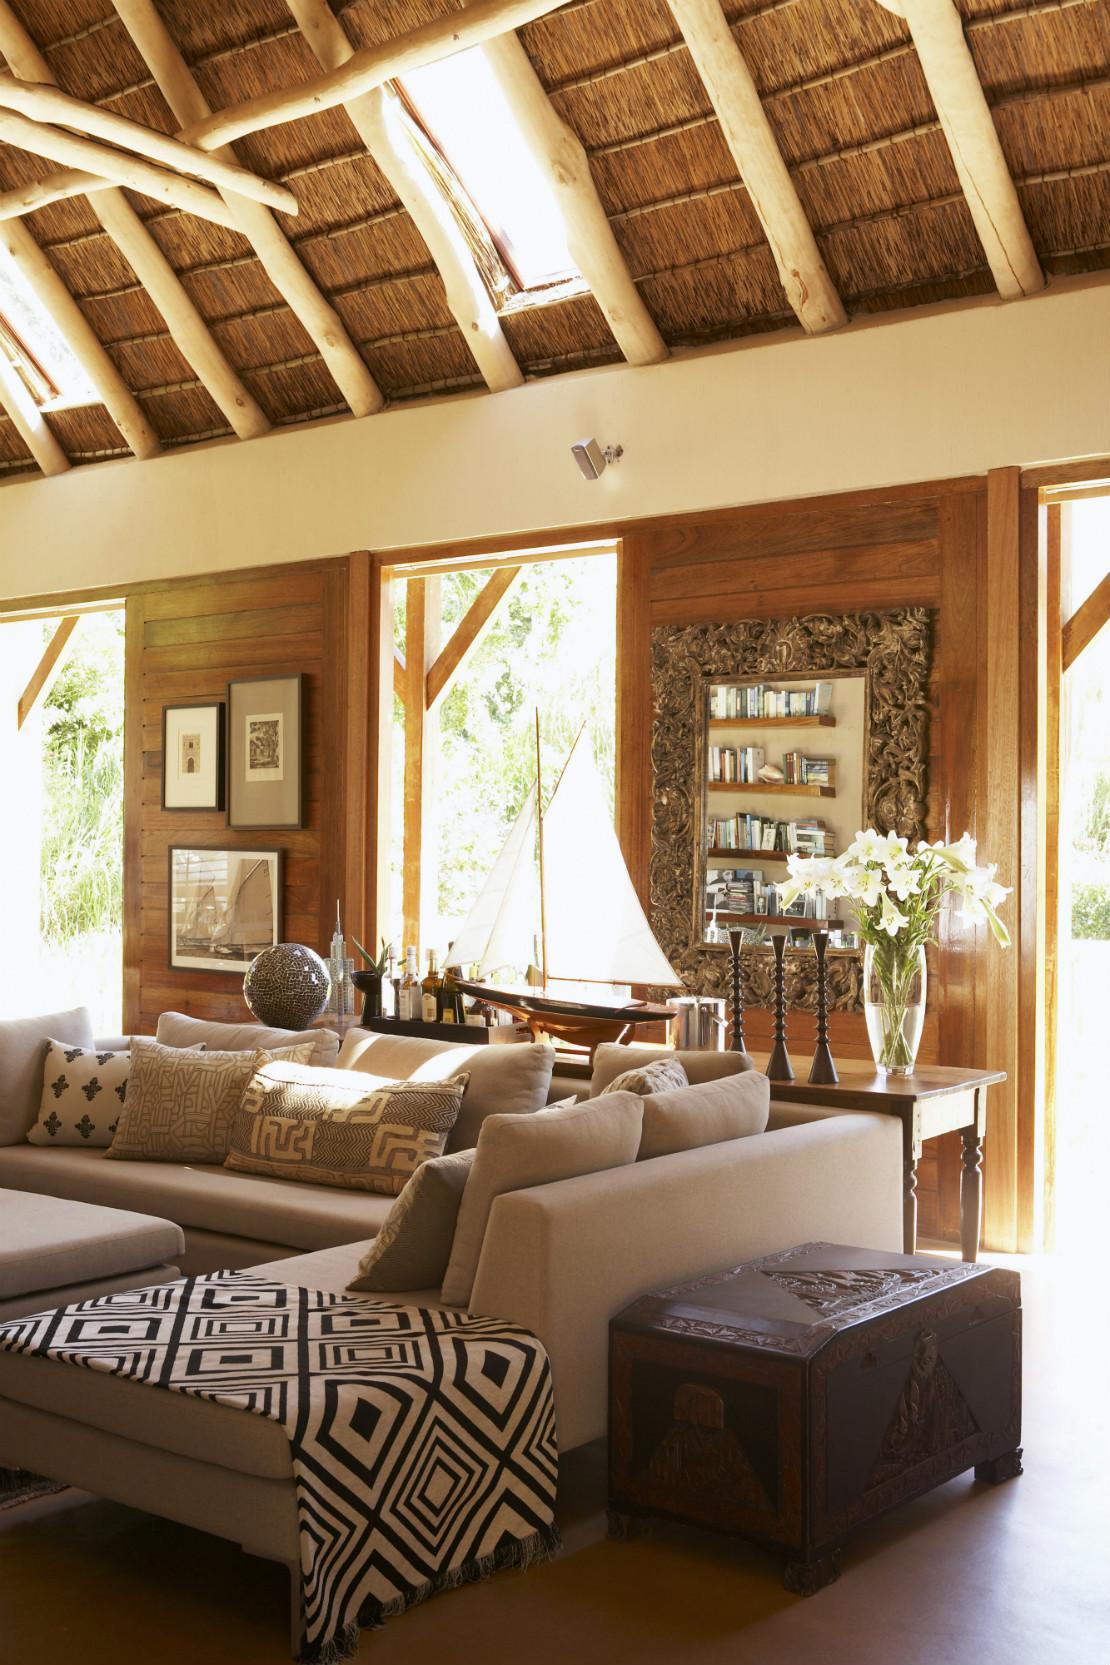 Estilo safari tu casa como un lodge africano westwing for Arredamento casa stile africano